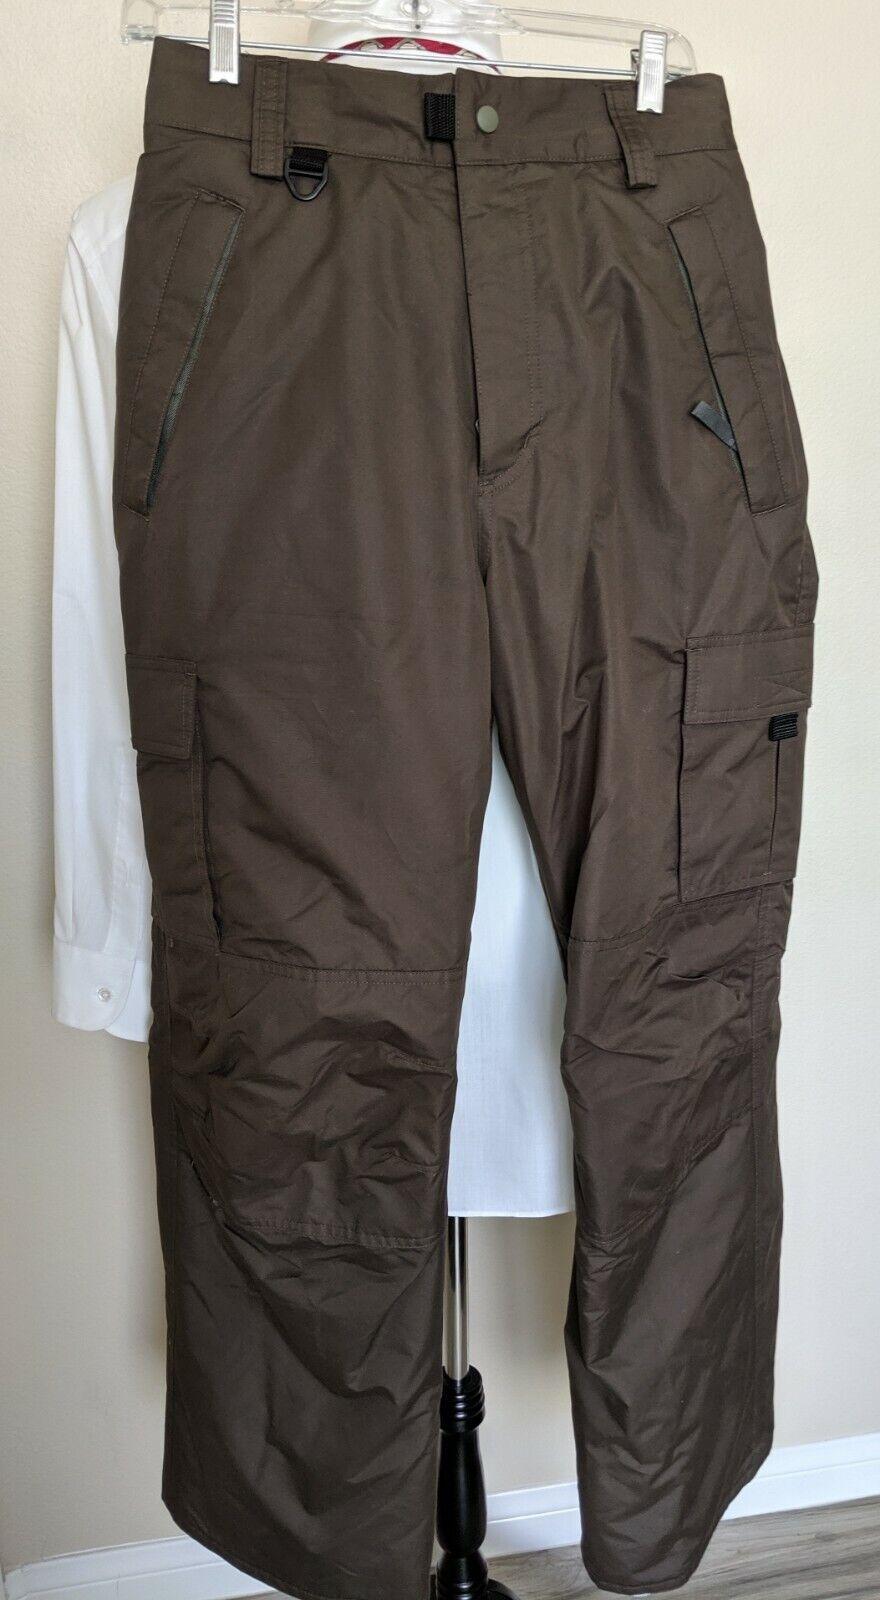 Turbine Women's Insulated Snowboard Pants Dark Brown Size Medium  MINT  amazing colorways